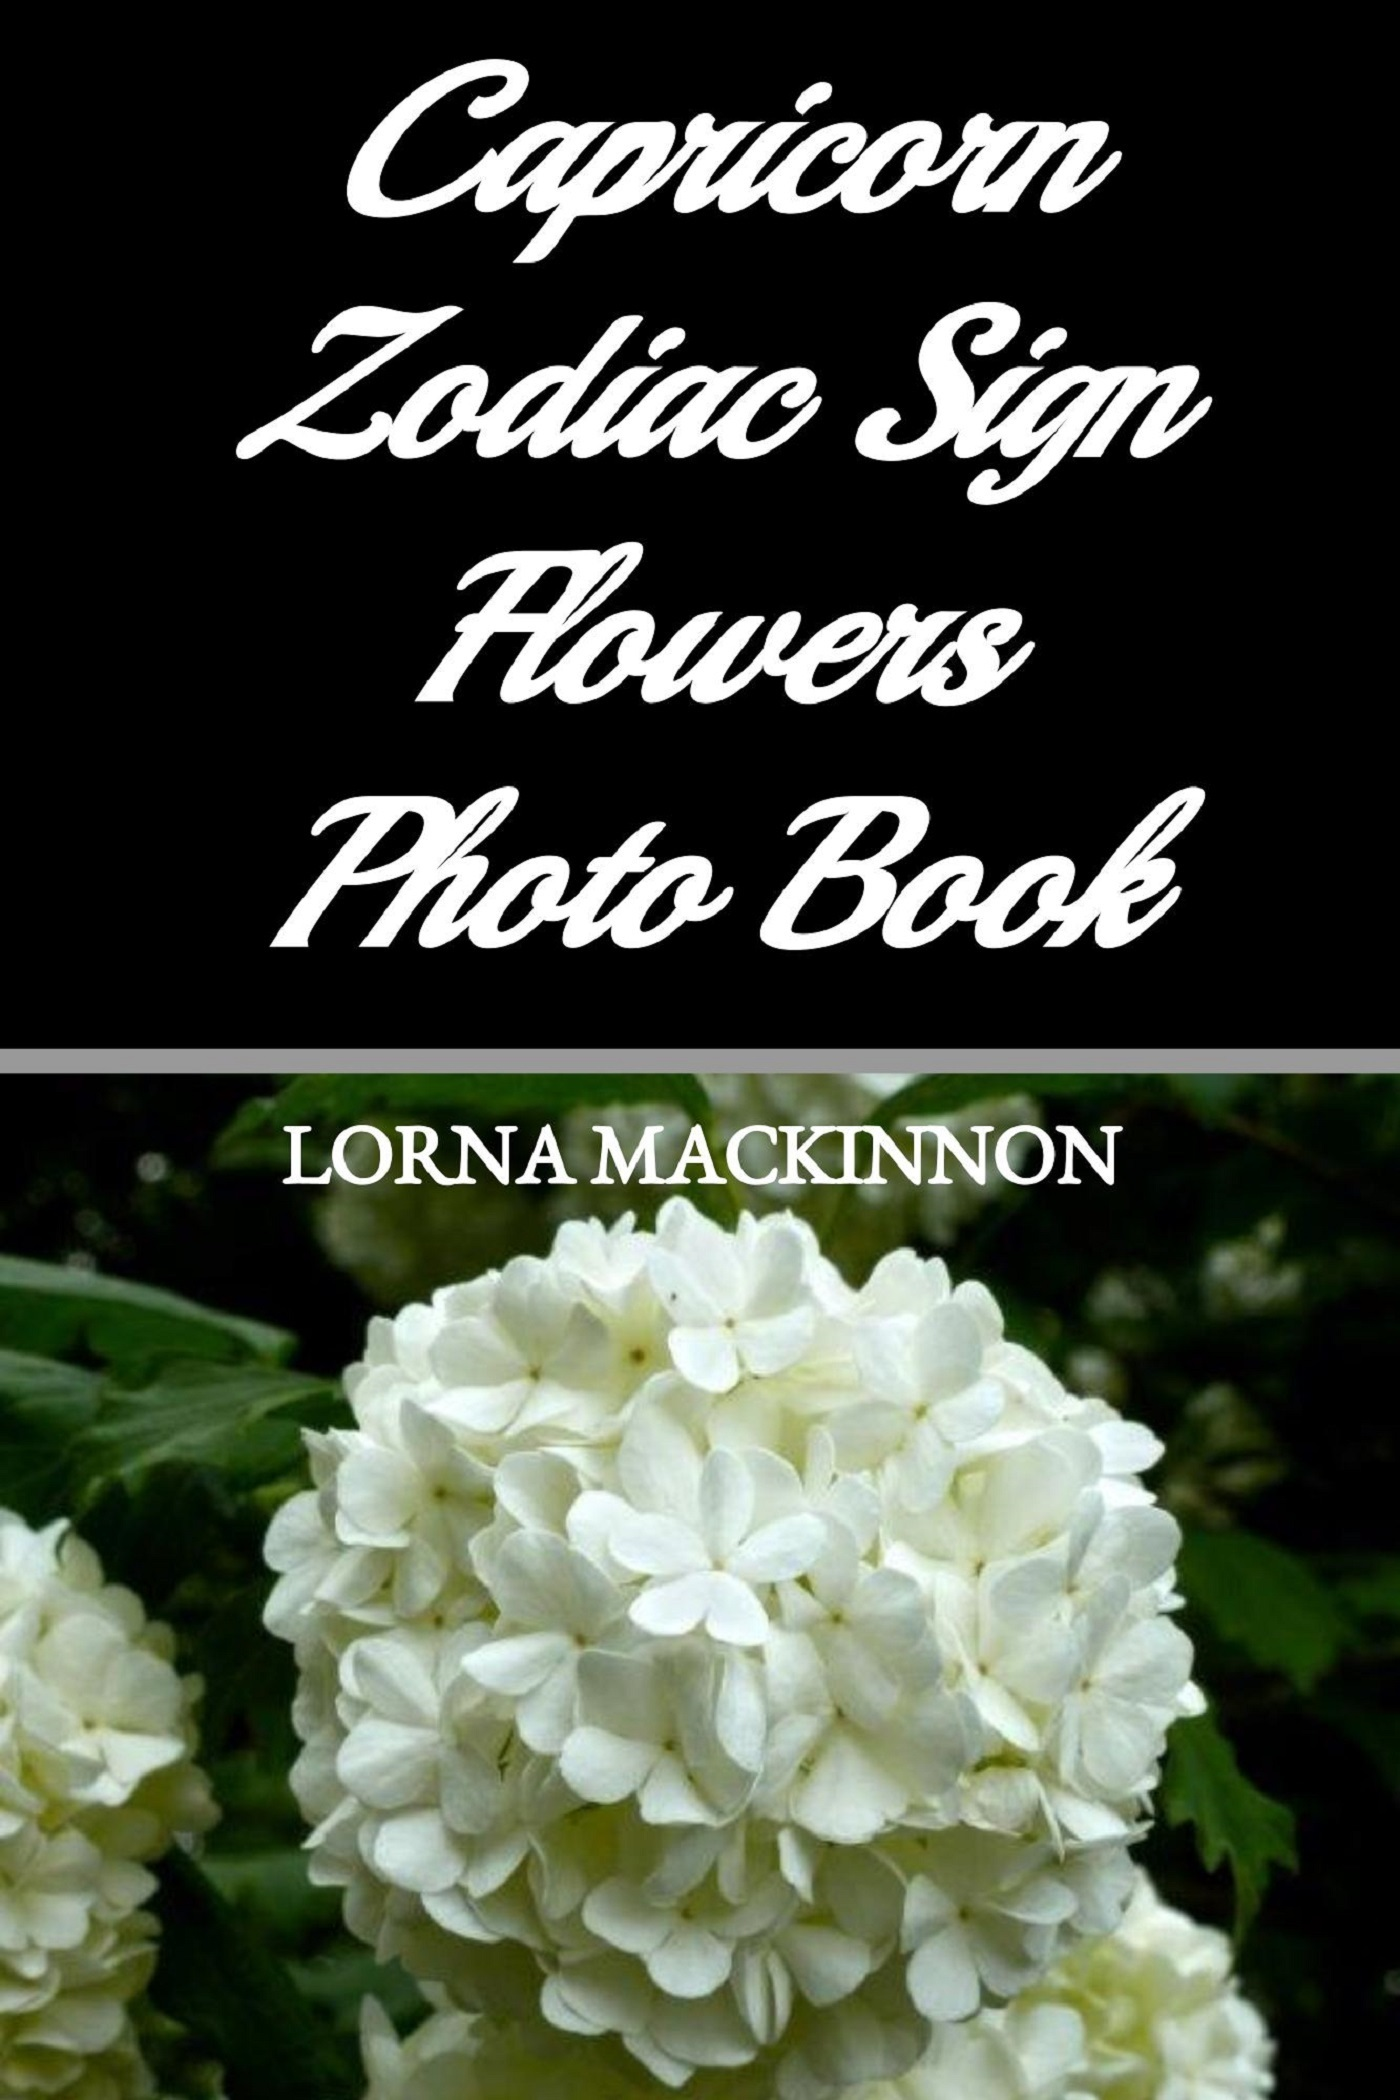 Capricorn Zodiac Sign Flowers Photo Book  by  Lorna Mackinnon